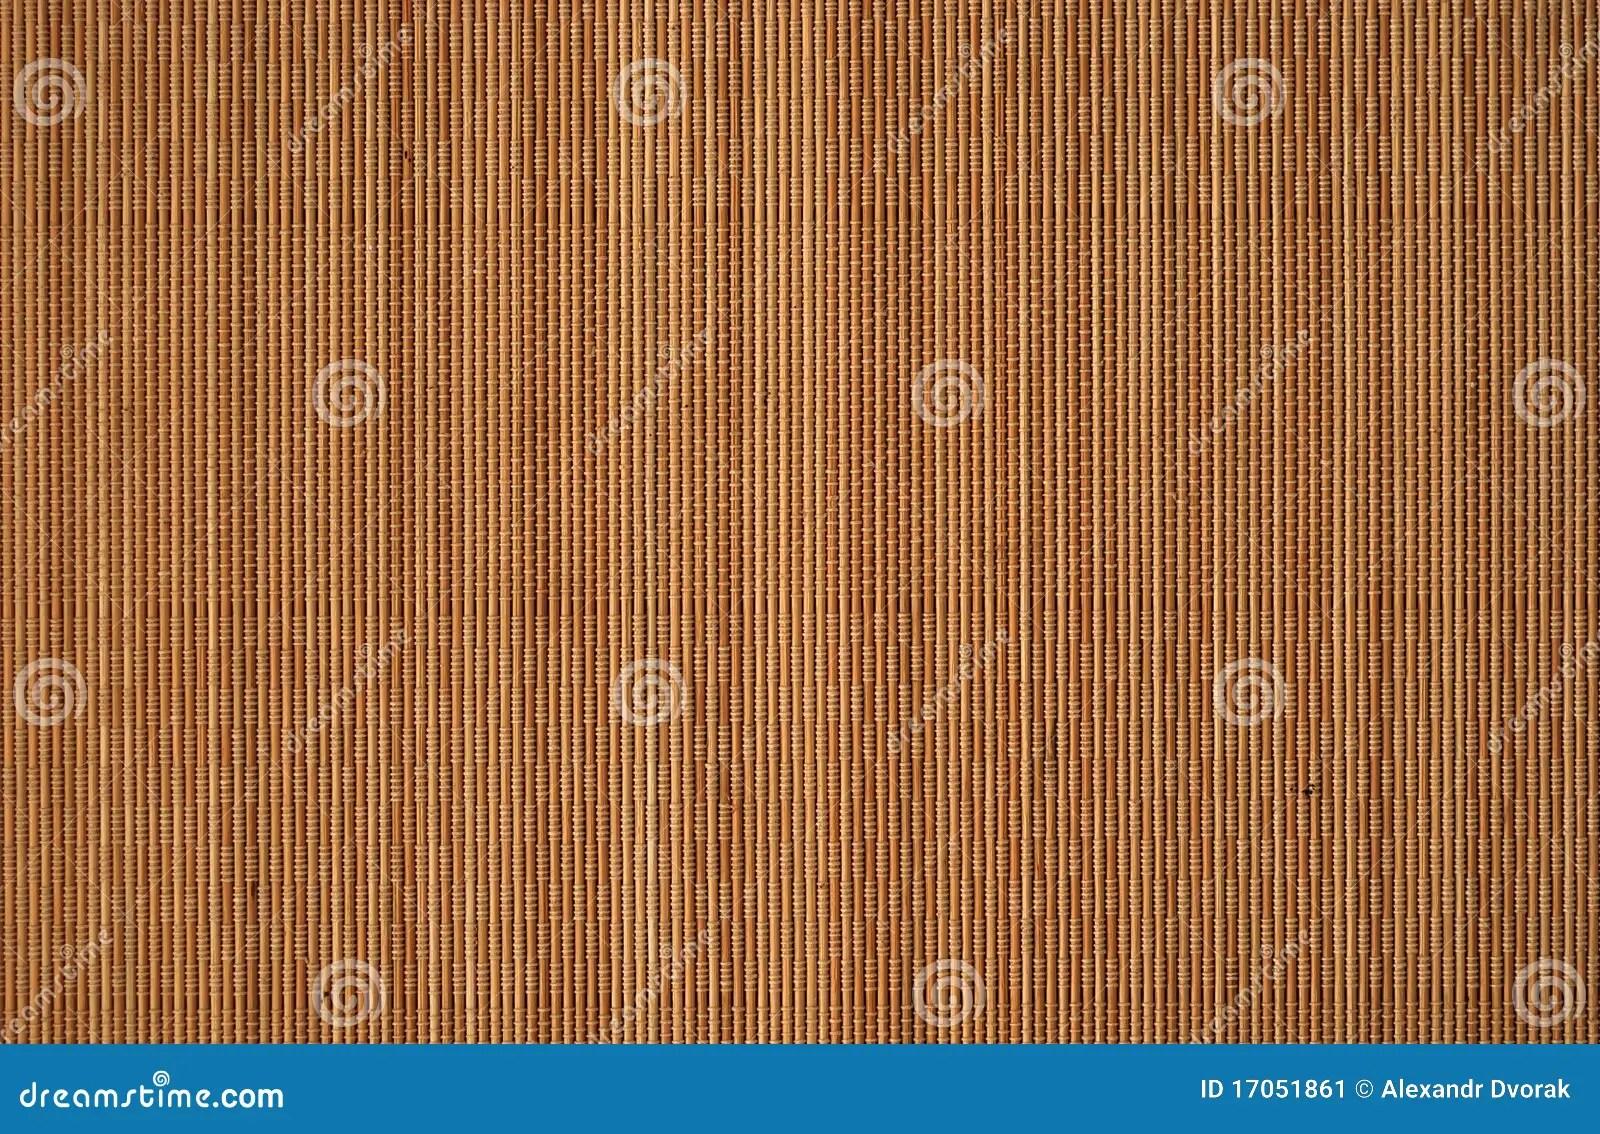 bambusplatte zuschnitt | bambusplatte swalif